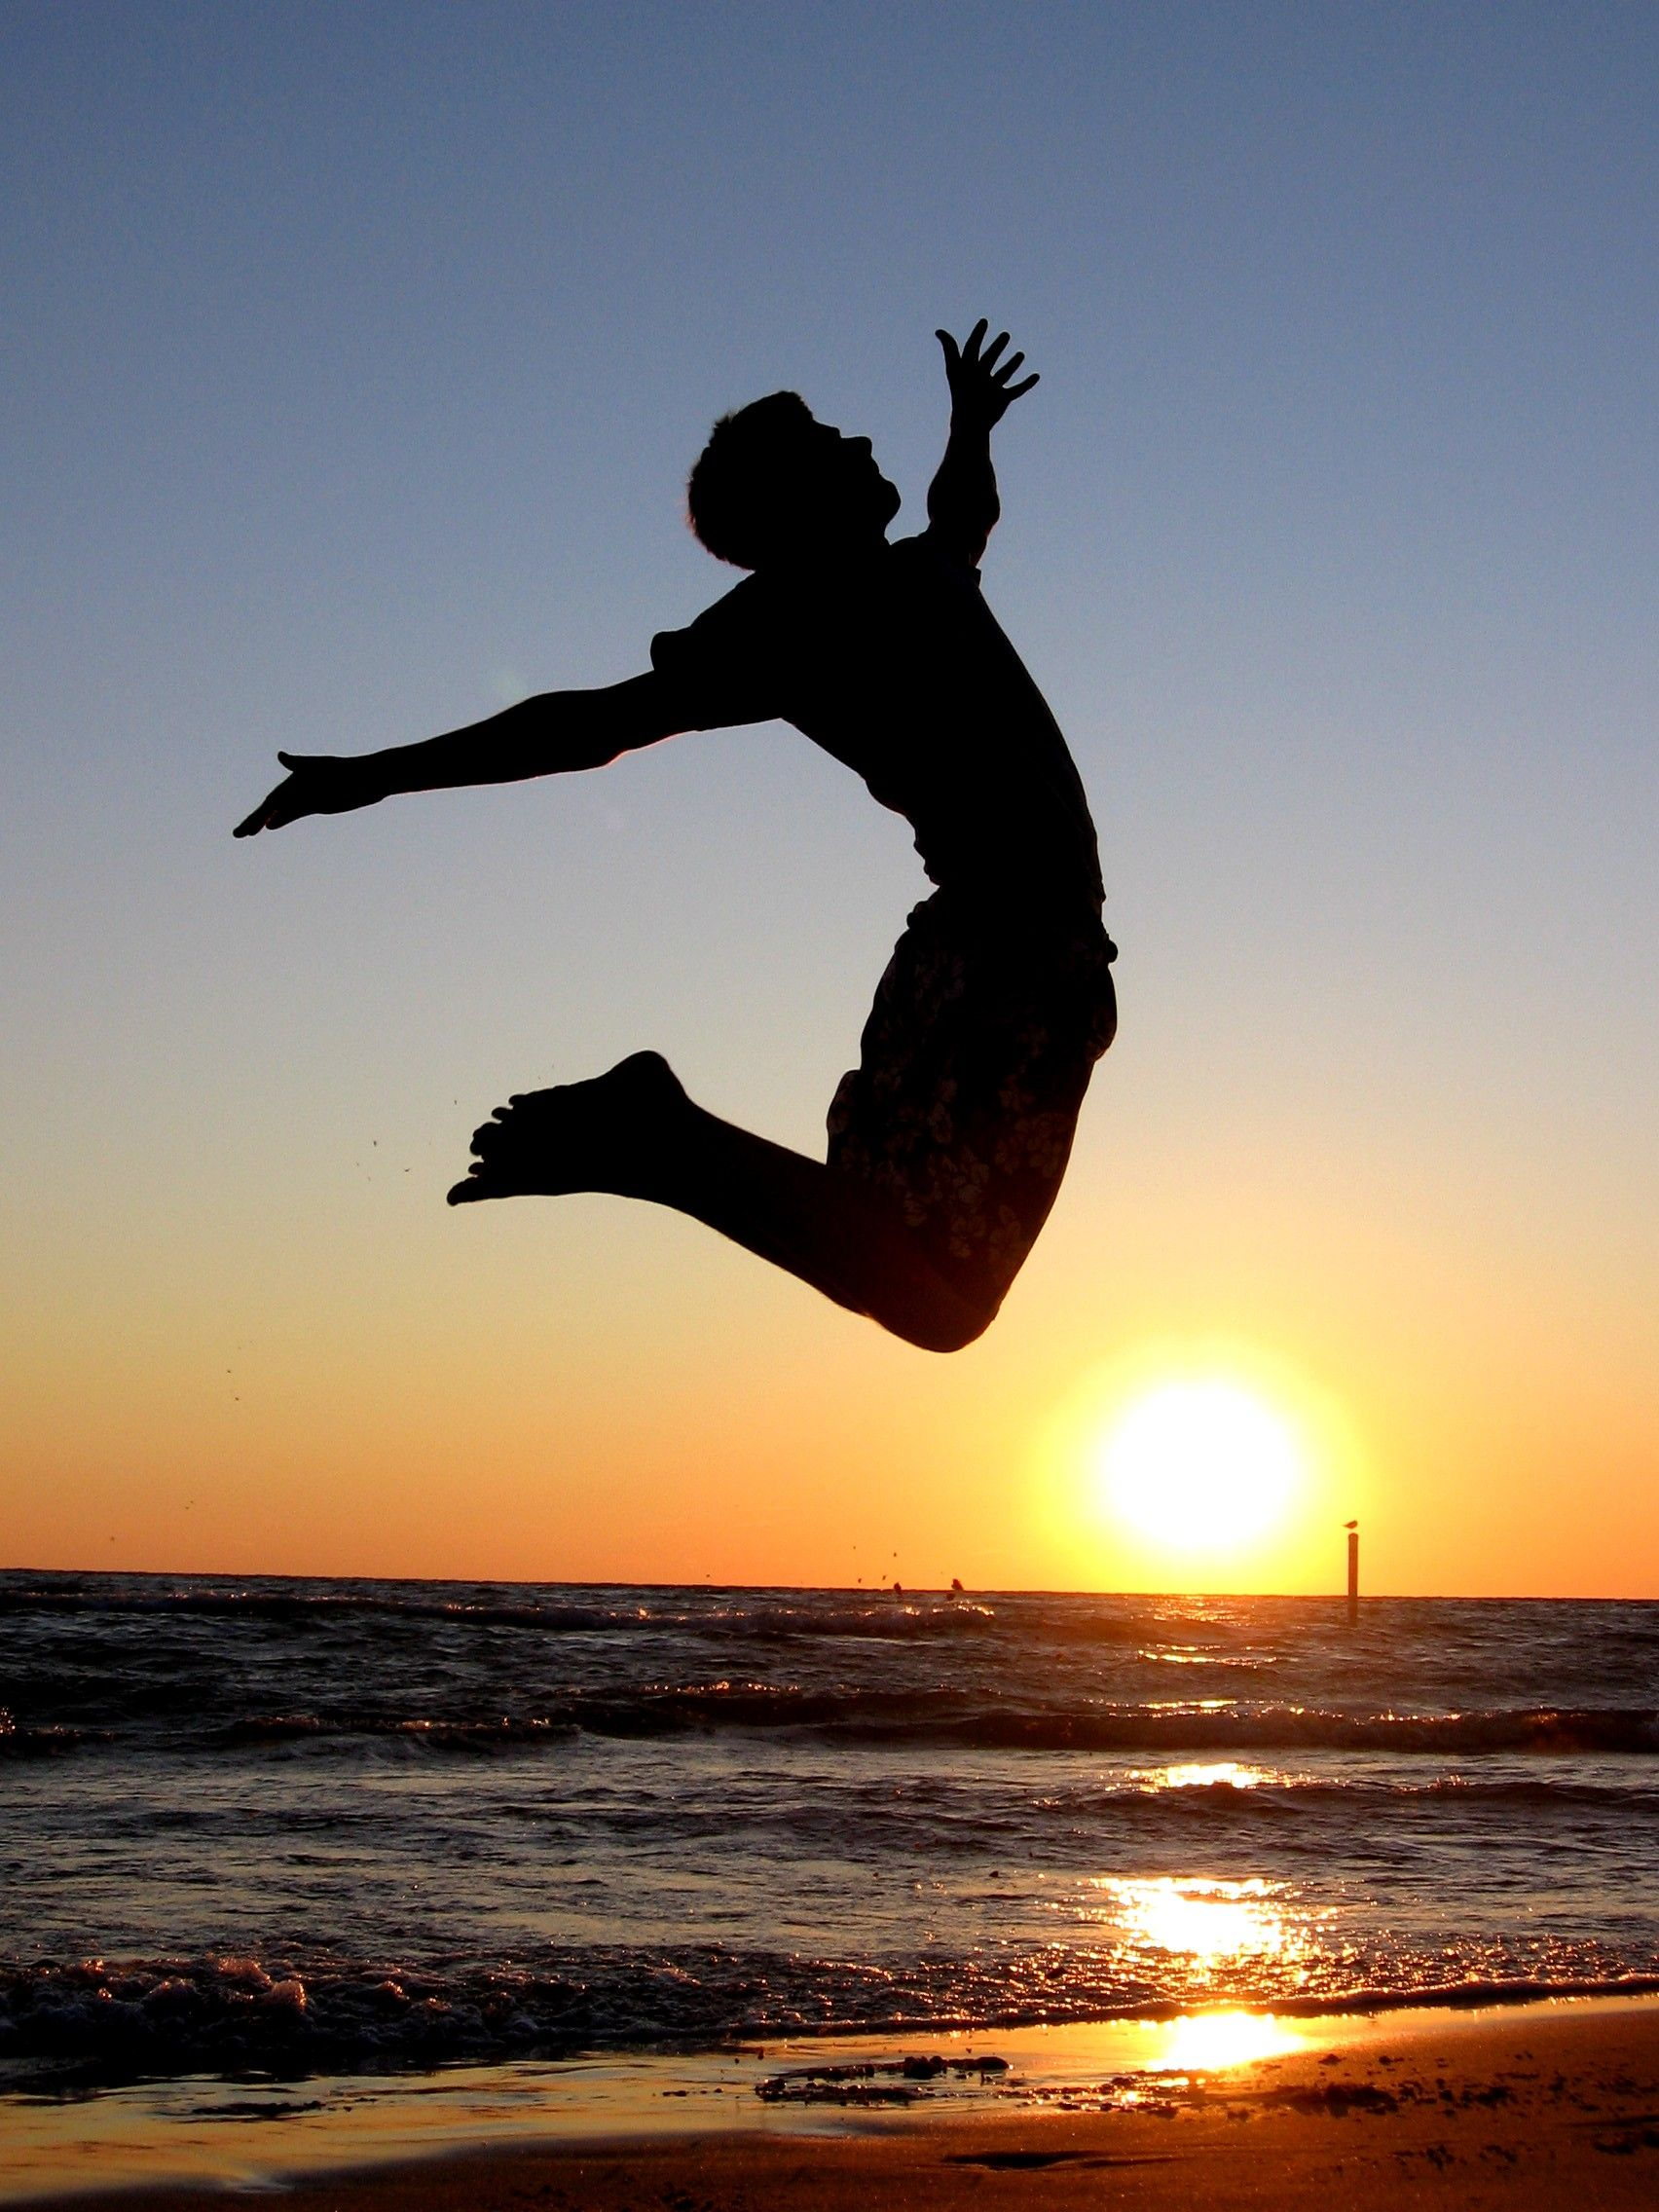 217. The Lukan Jump